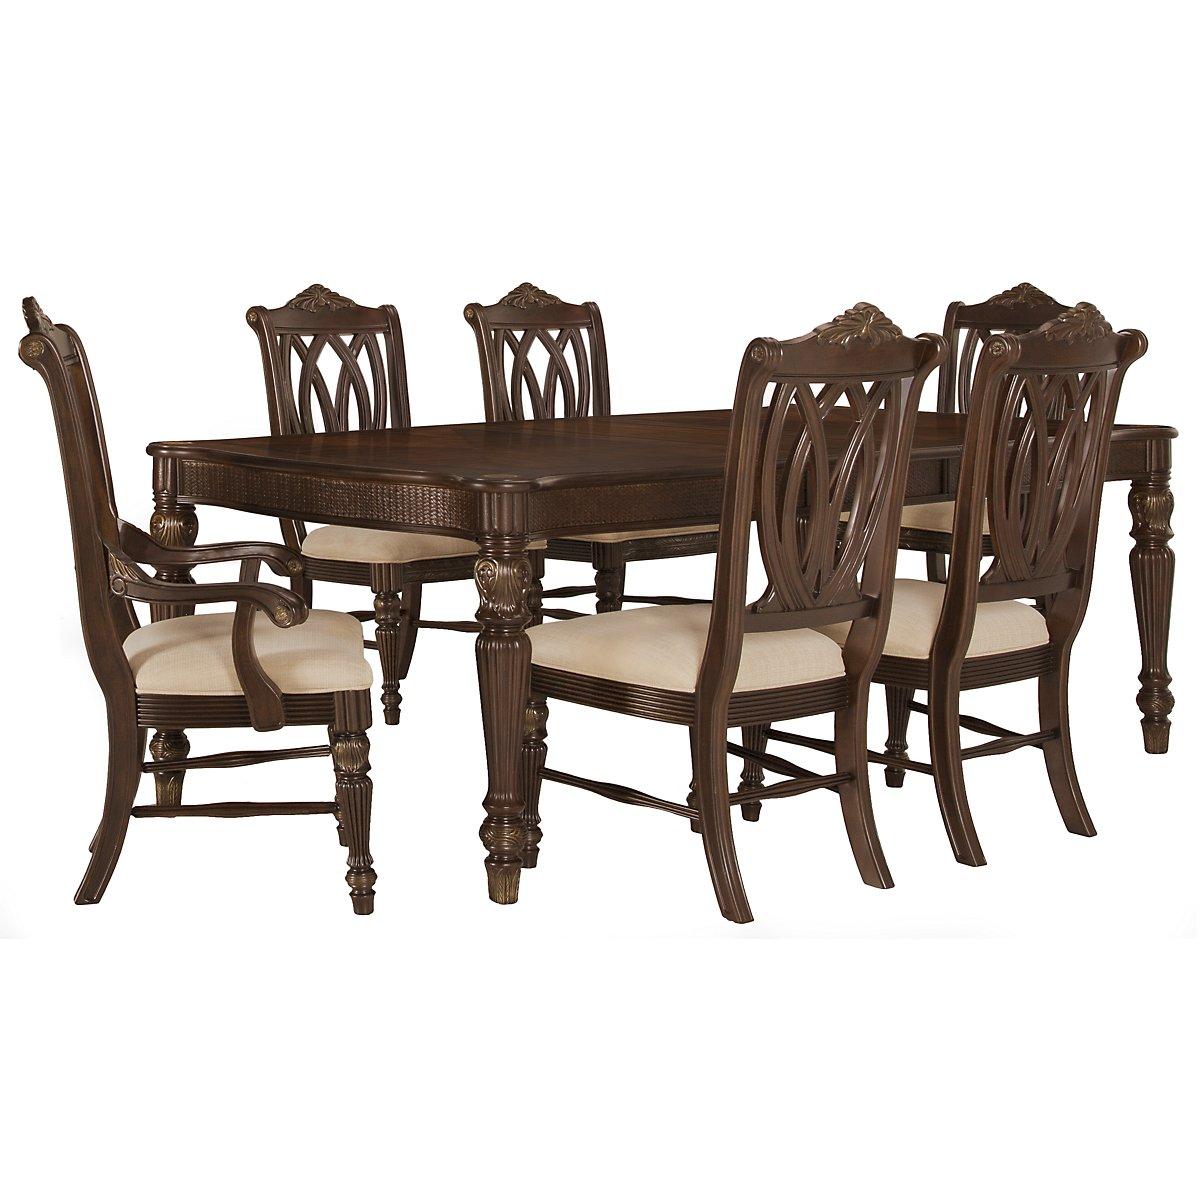 Tradewinds Dark Tone Rectangular Table & 4 Wood Chairs